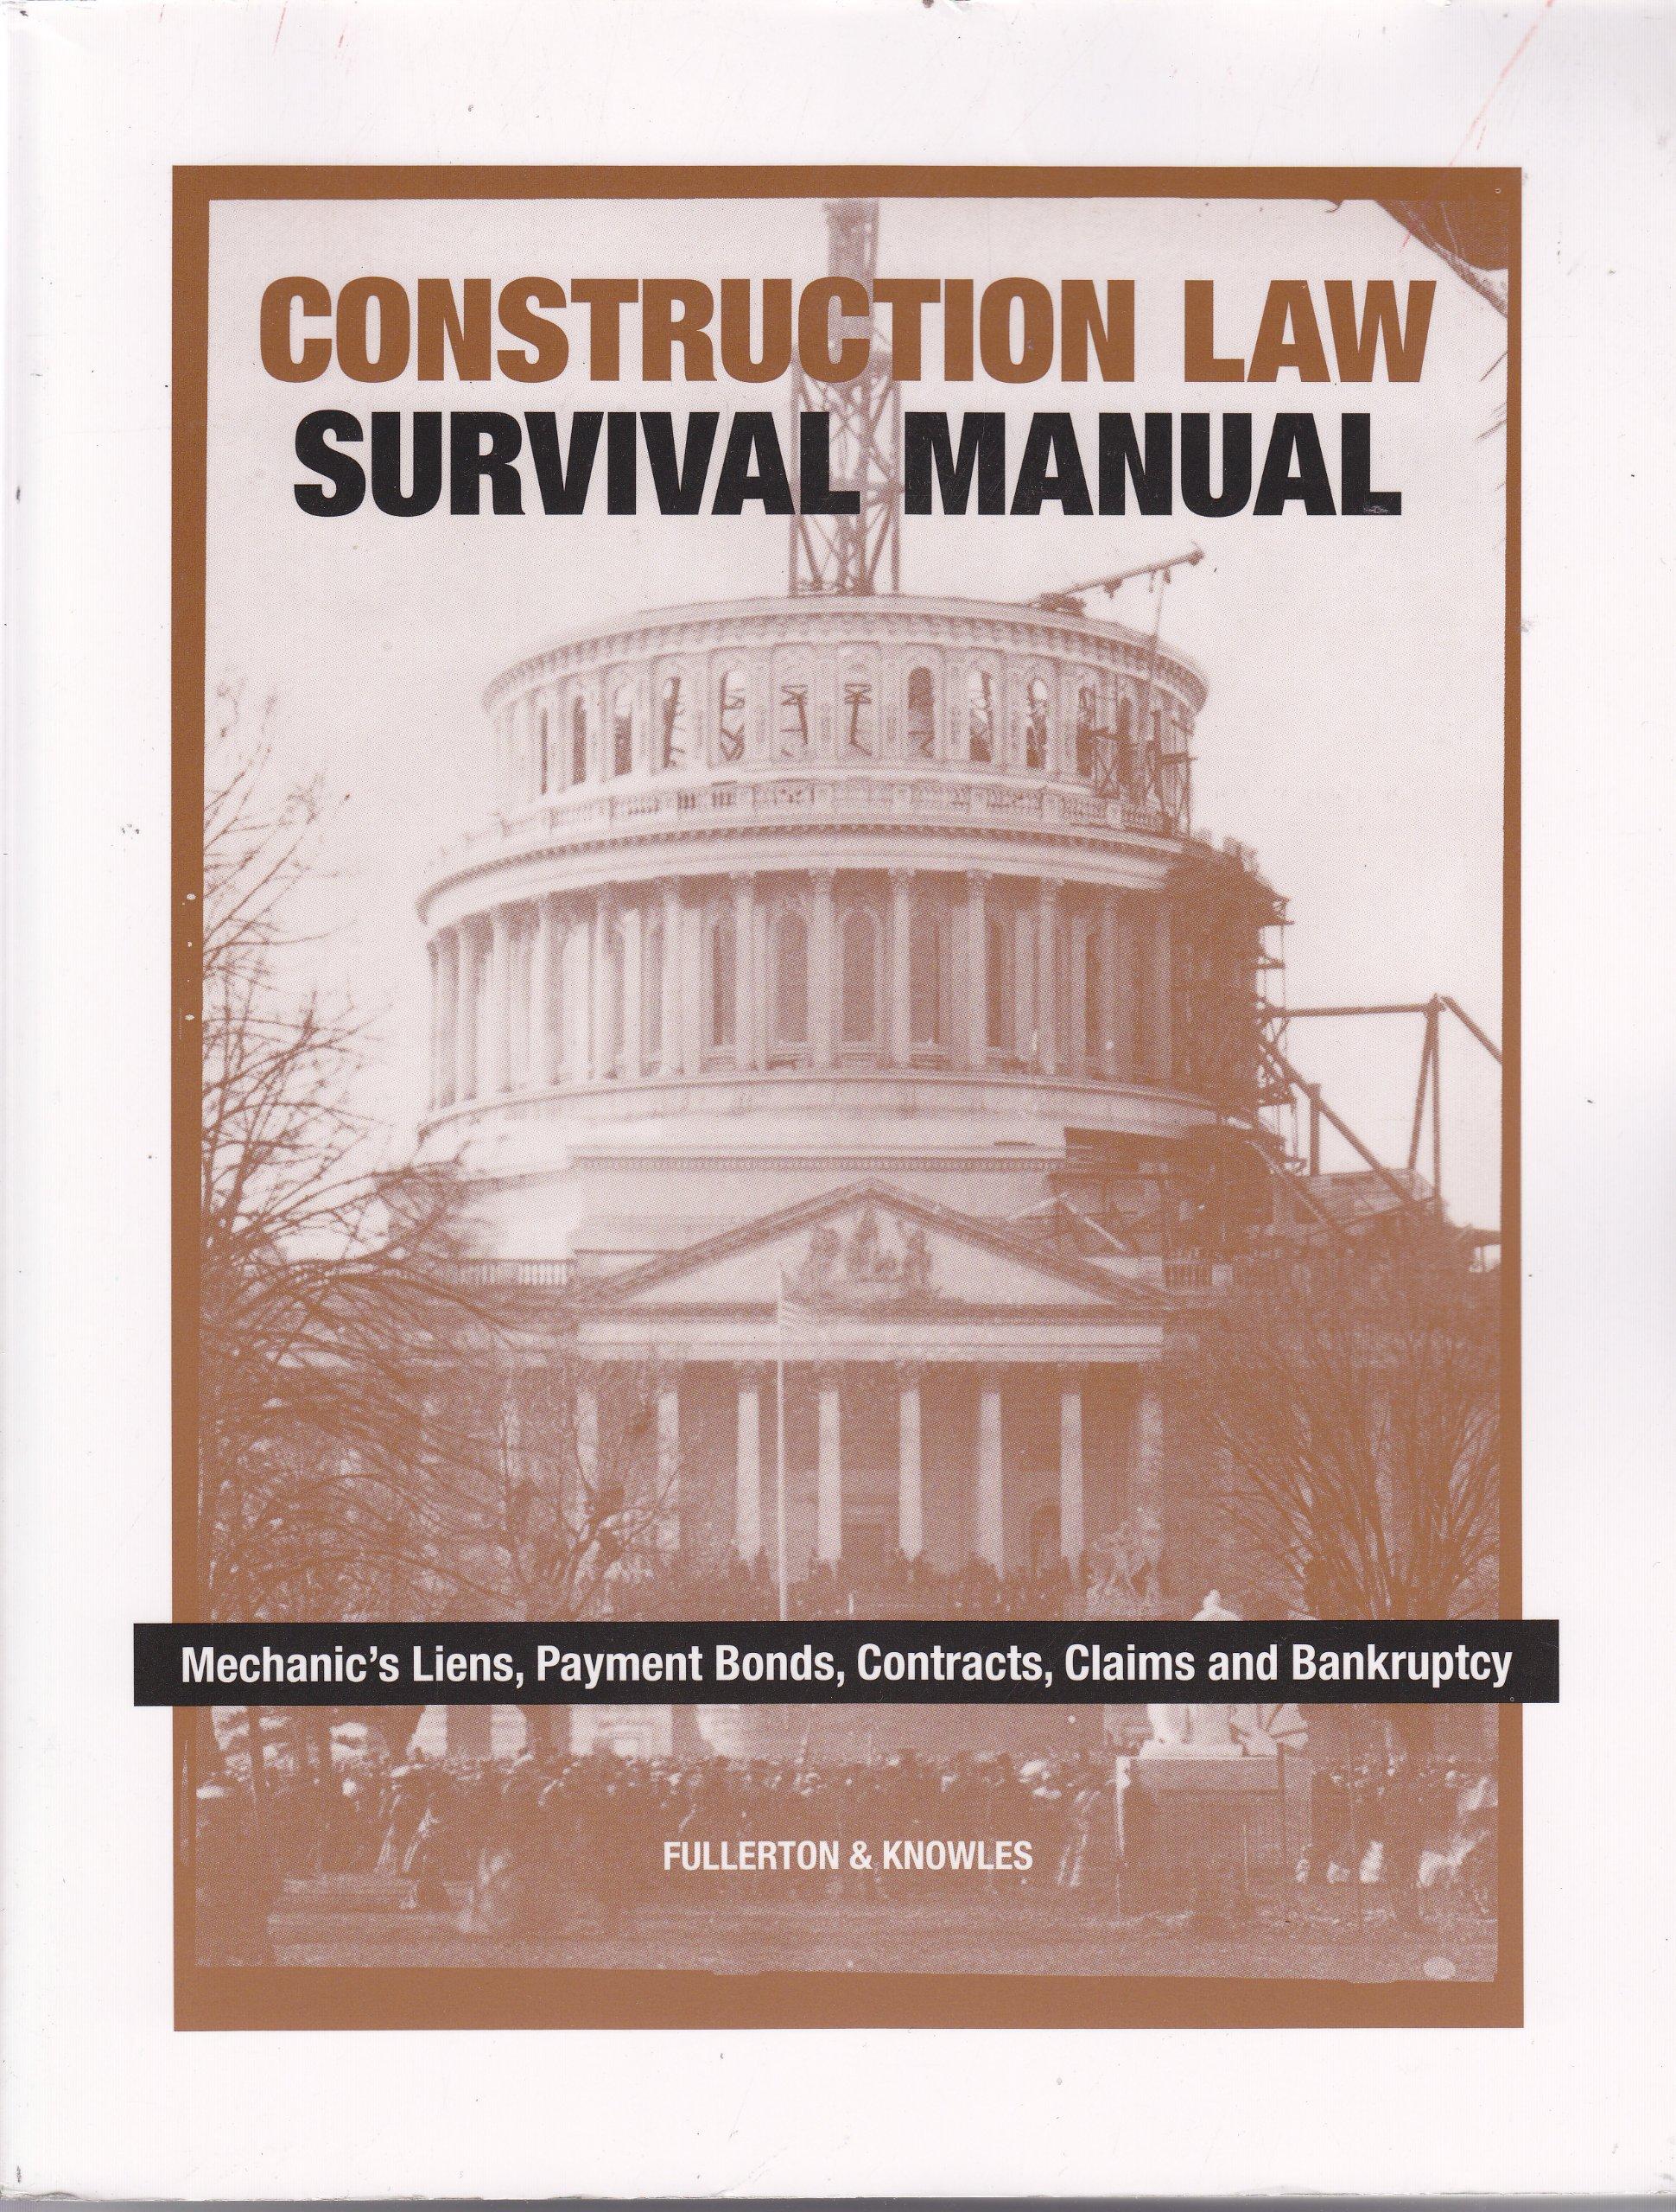 Construction Law Survival Manual: Mechanics Liens, Payment Bonds, Contracts, Claims and Bankrupcy pdf epub